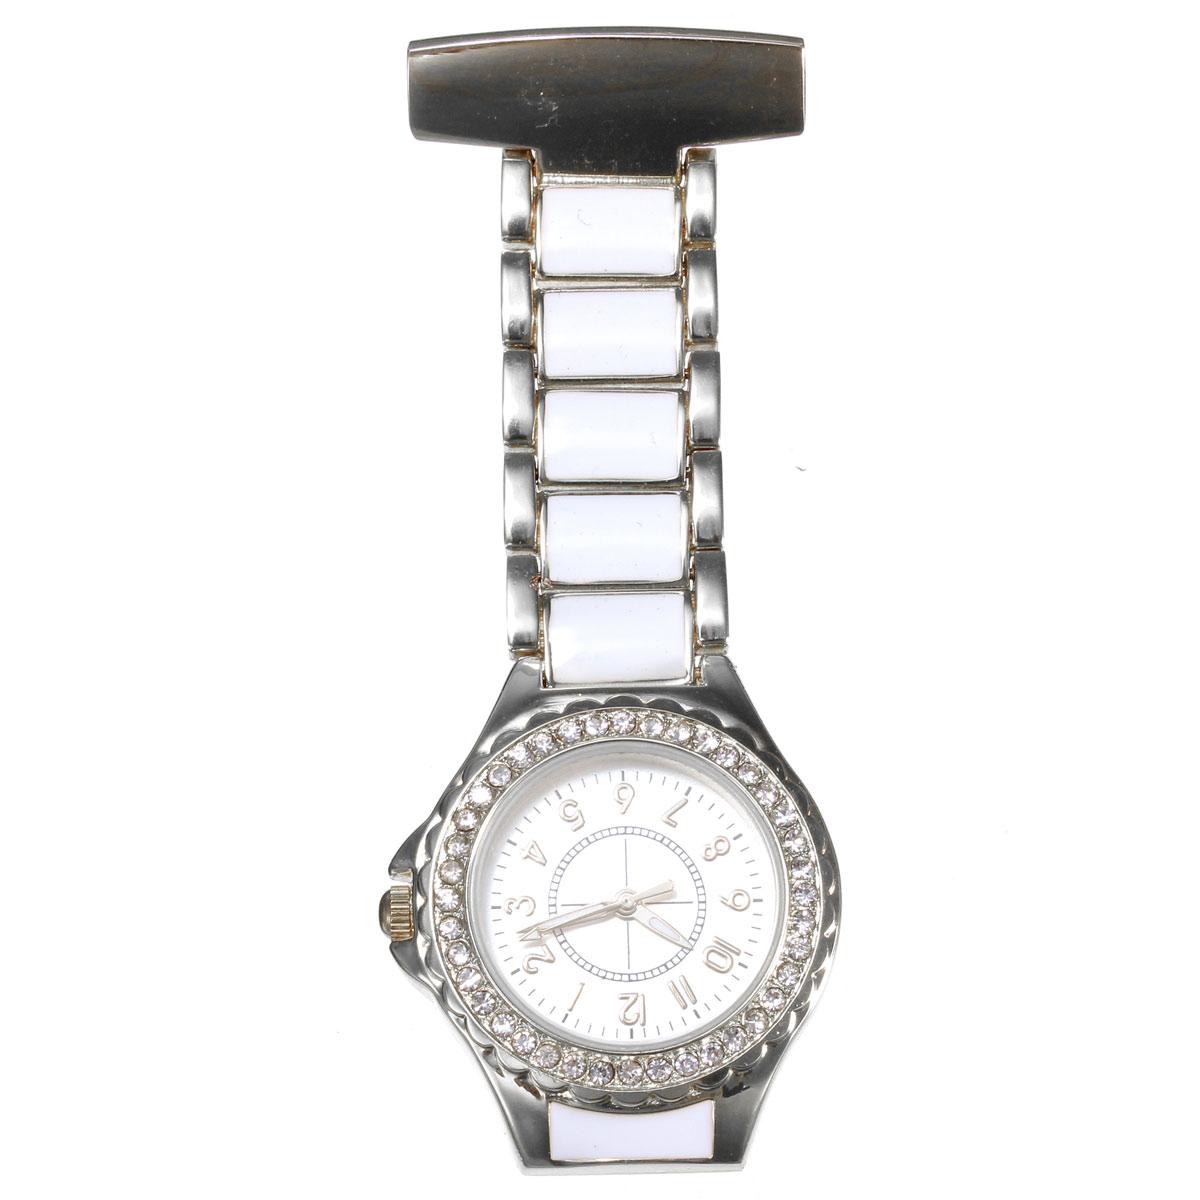 Fashion Nurse Watch Rhinestones Brooch Stainless Steel Quartz Fob Pocket Watch